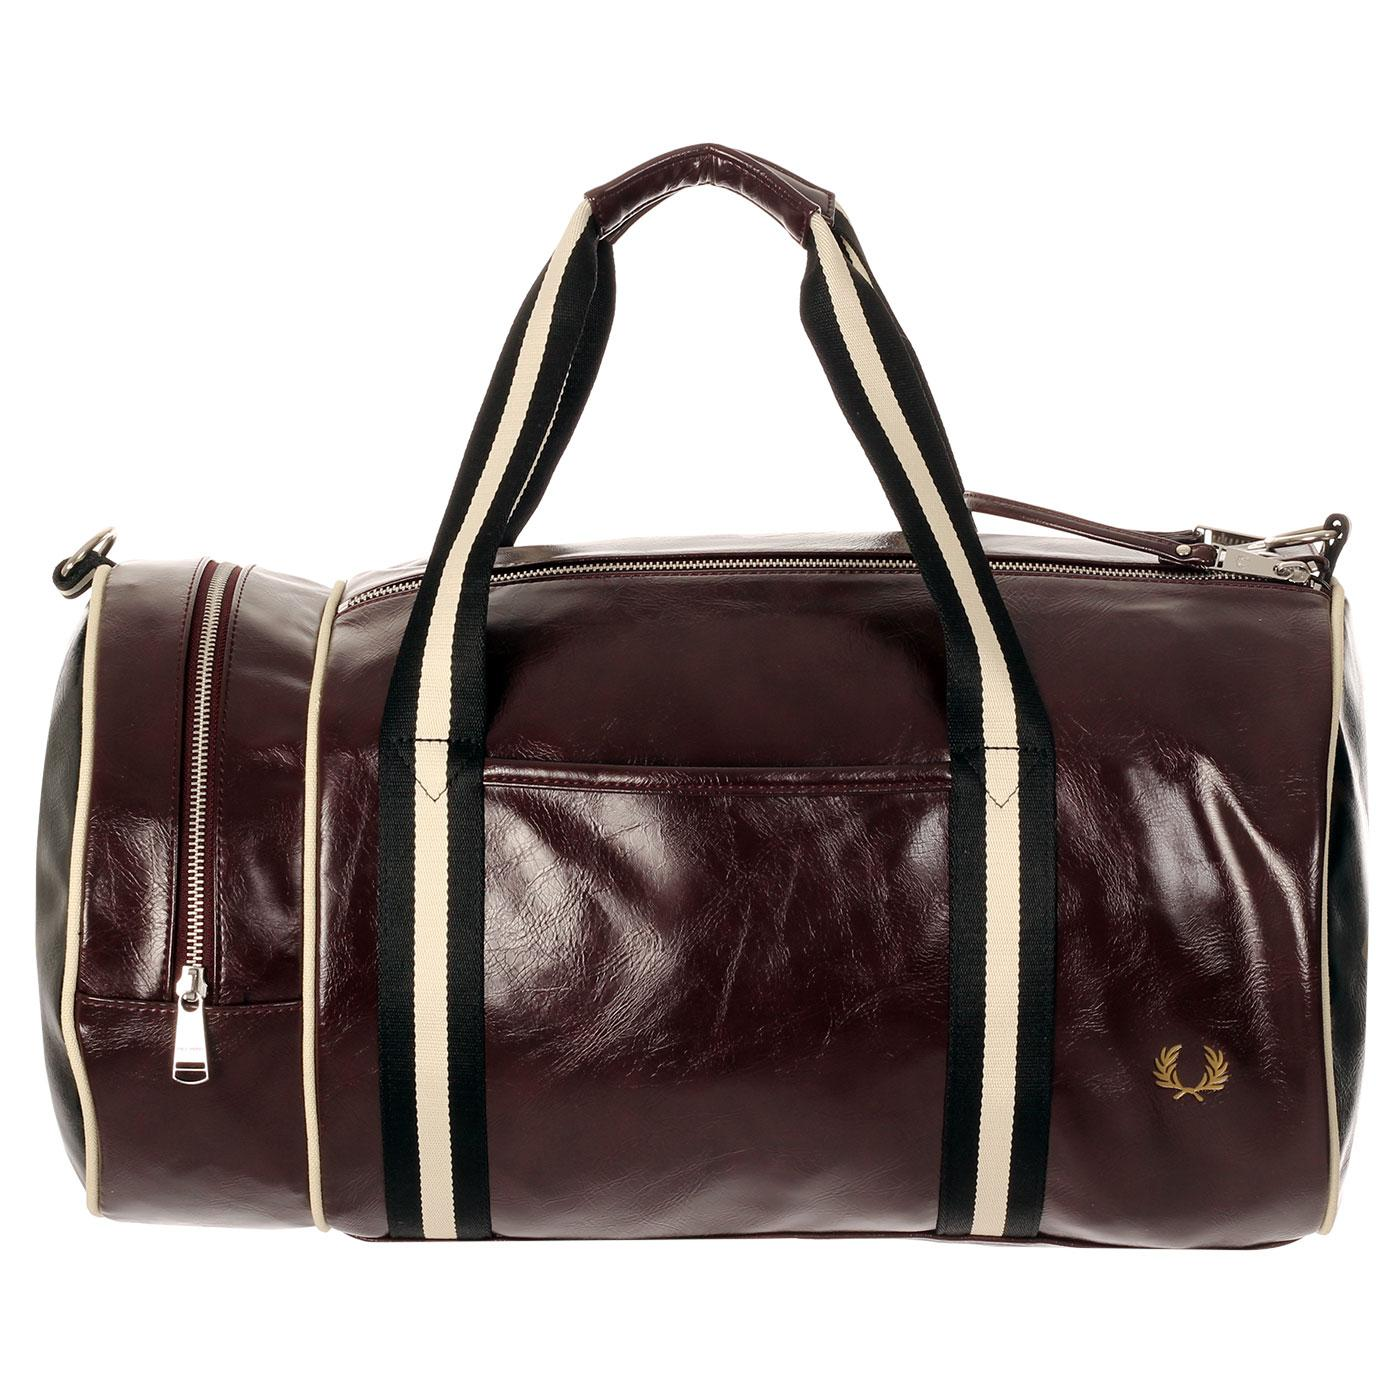 FRED PERRY Contrast Colour Barrel Bag - Port/Black